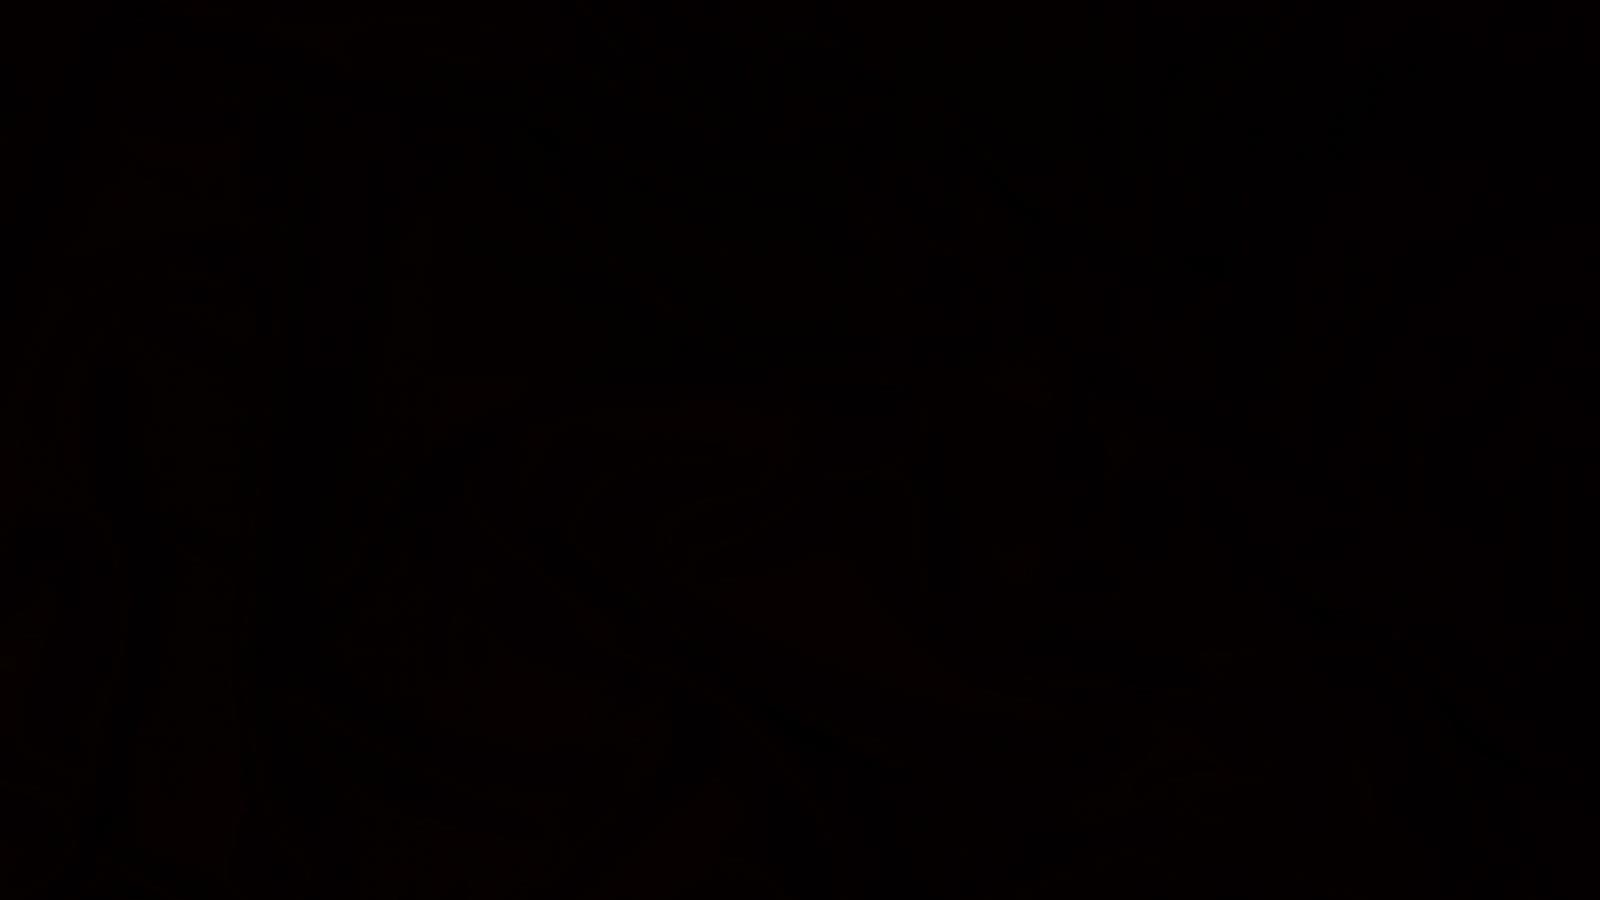 Free Black Background